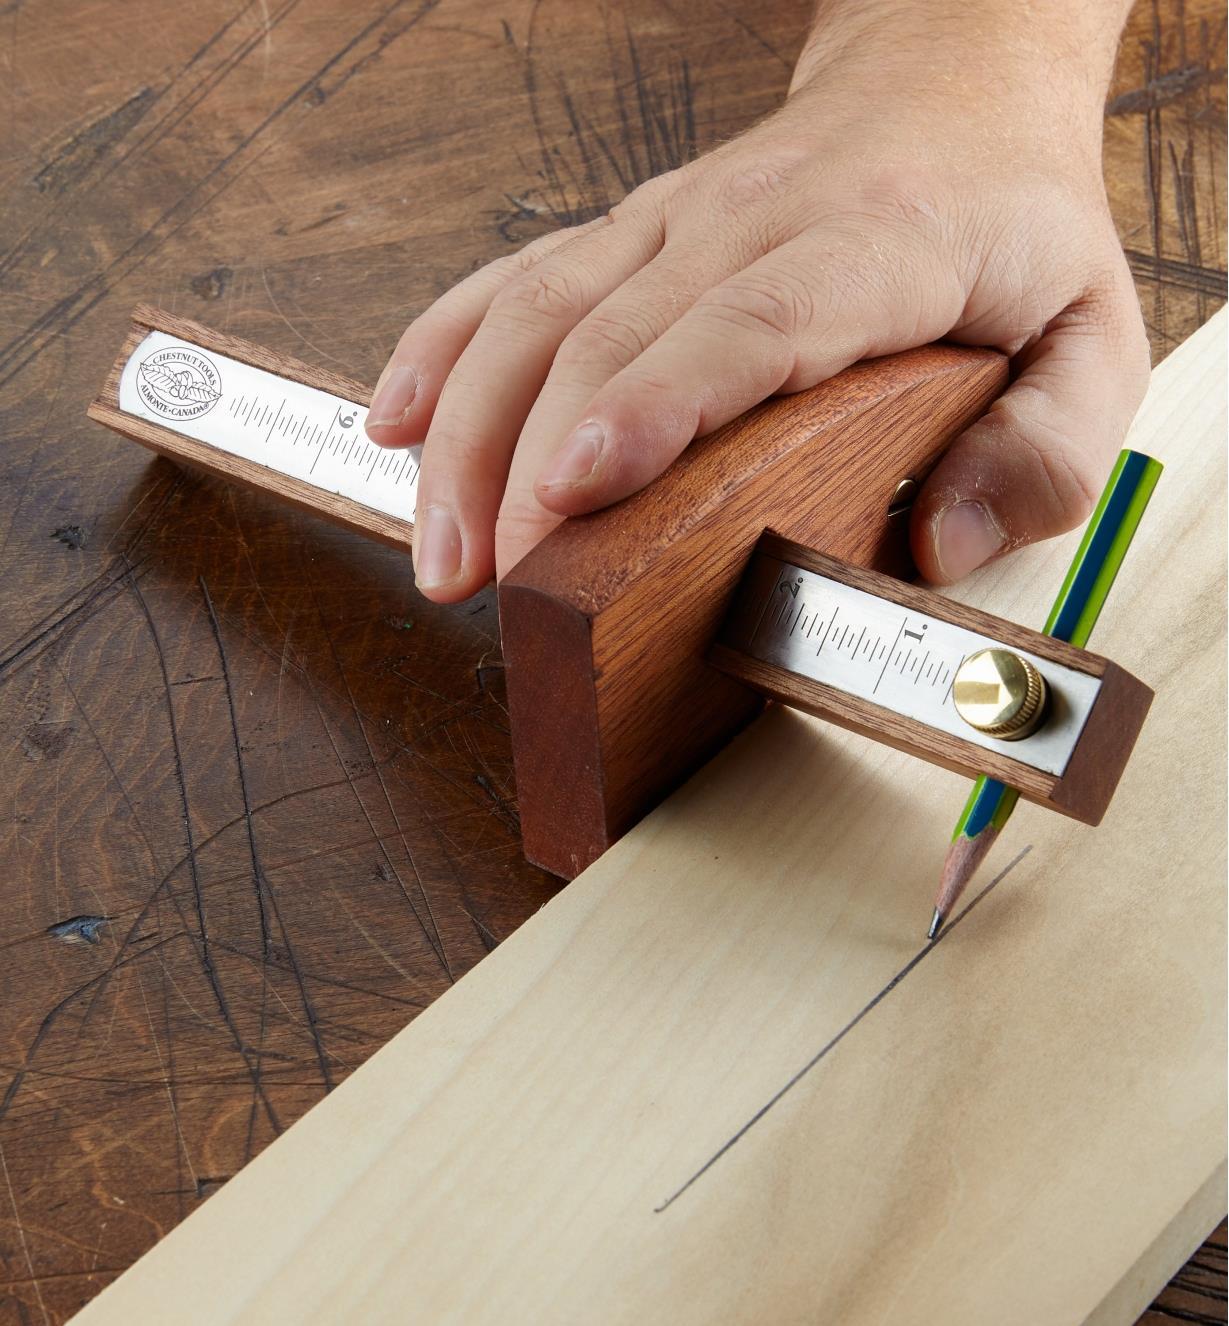 09A0141 - Wood Marking Gauge